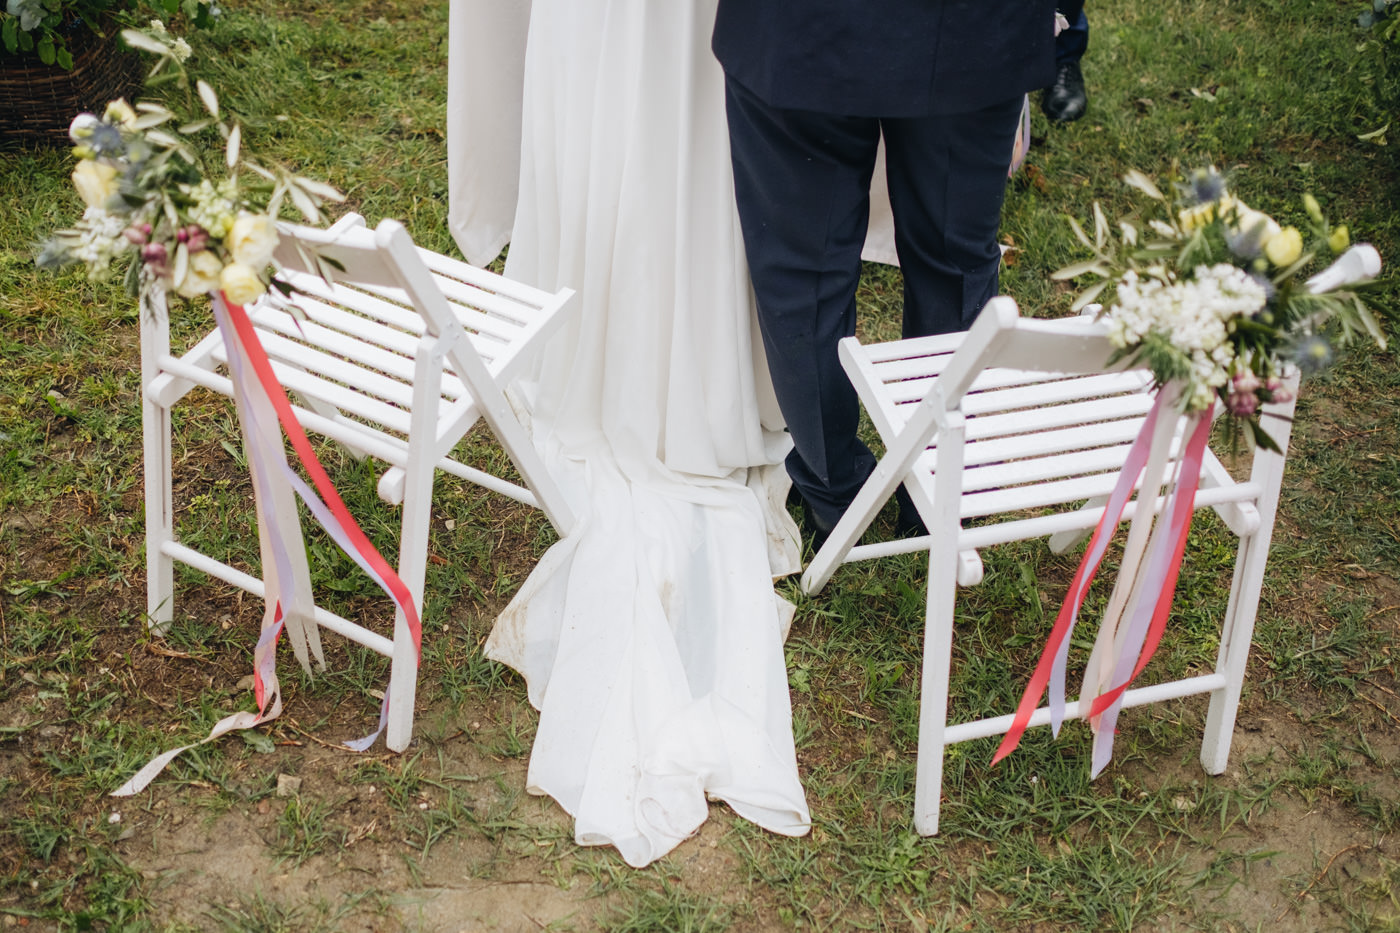 matrimoni_all_italiana_fotografo_matrimonio_toscana-34.jpg